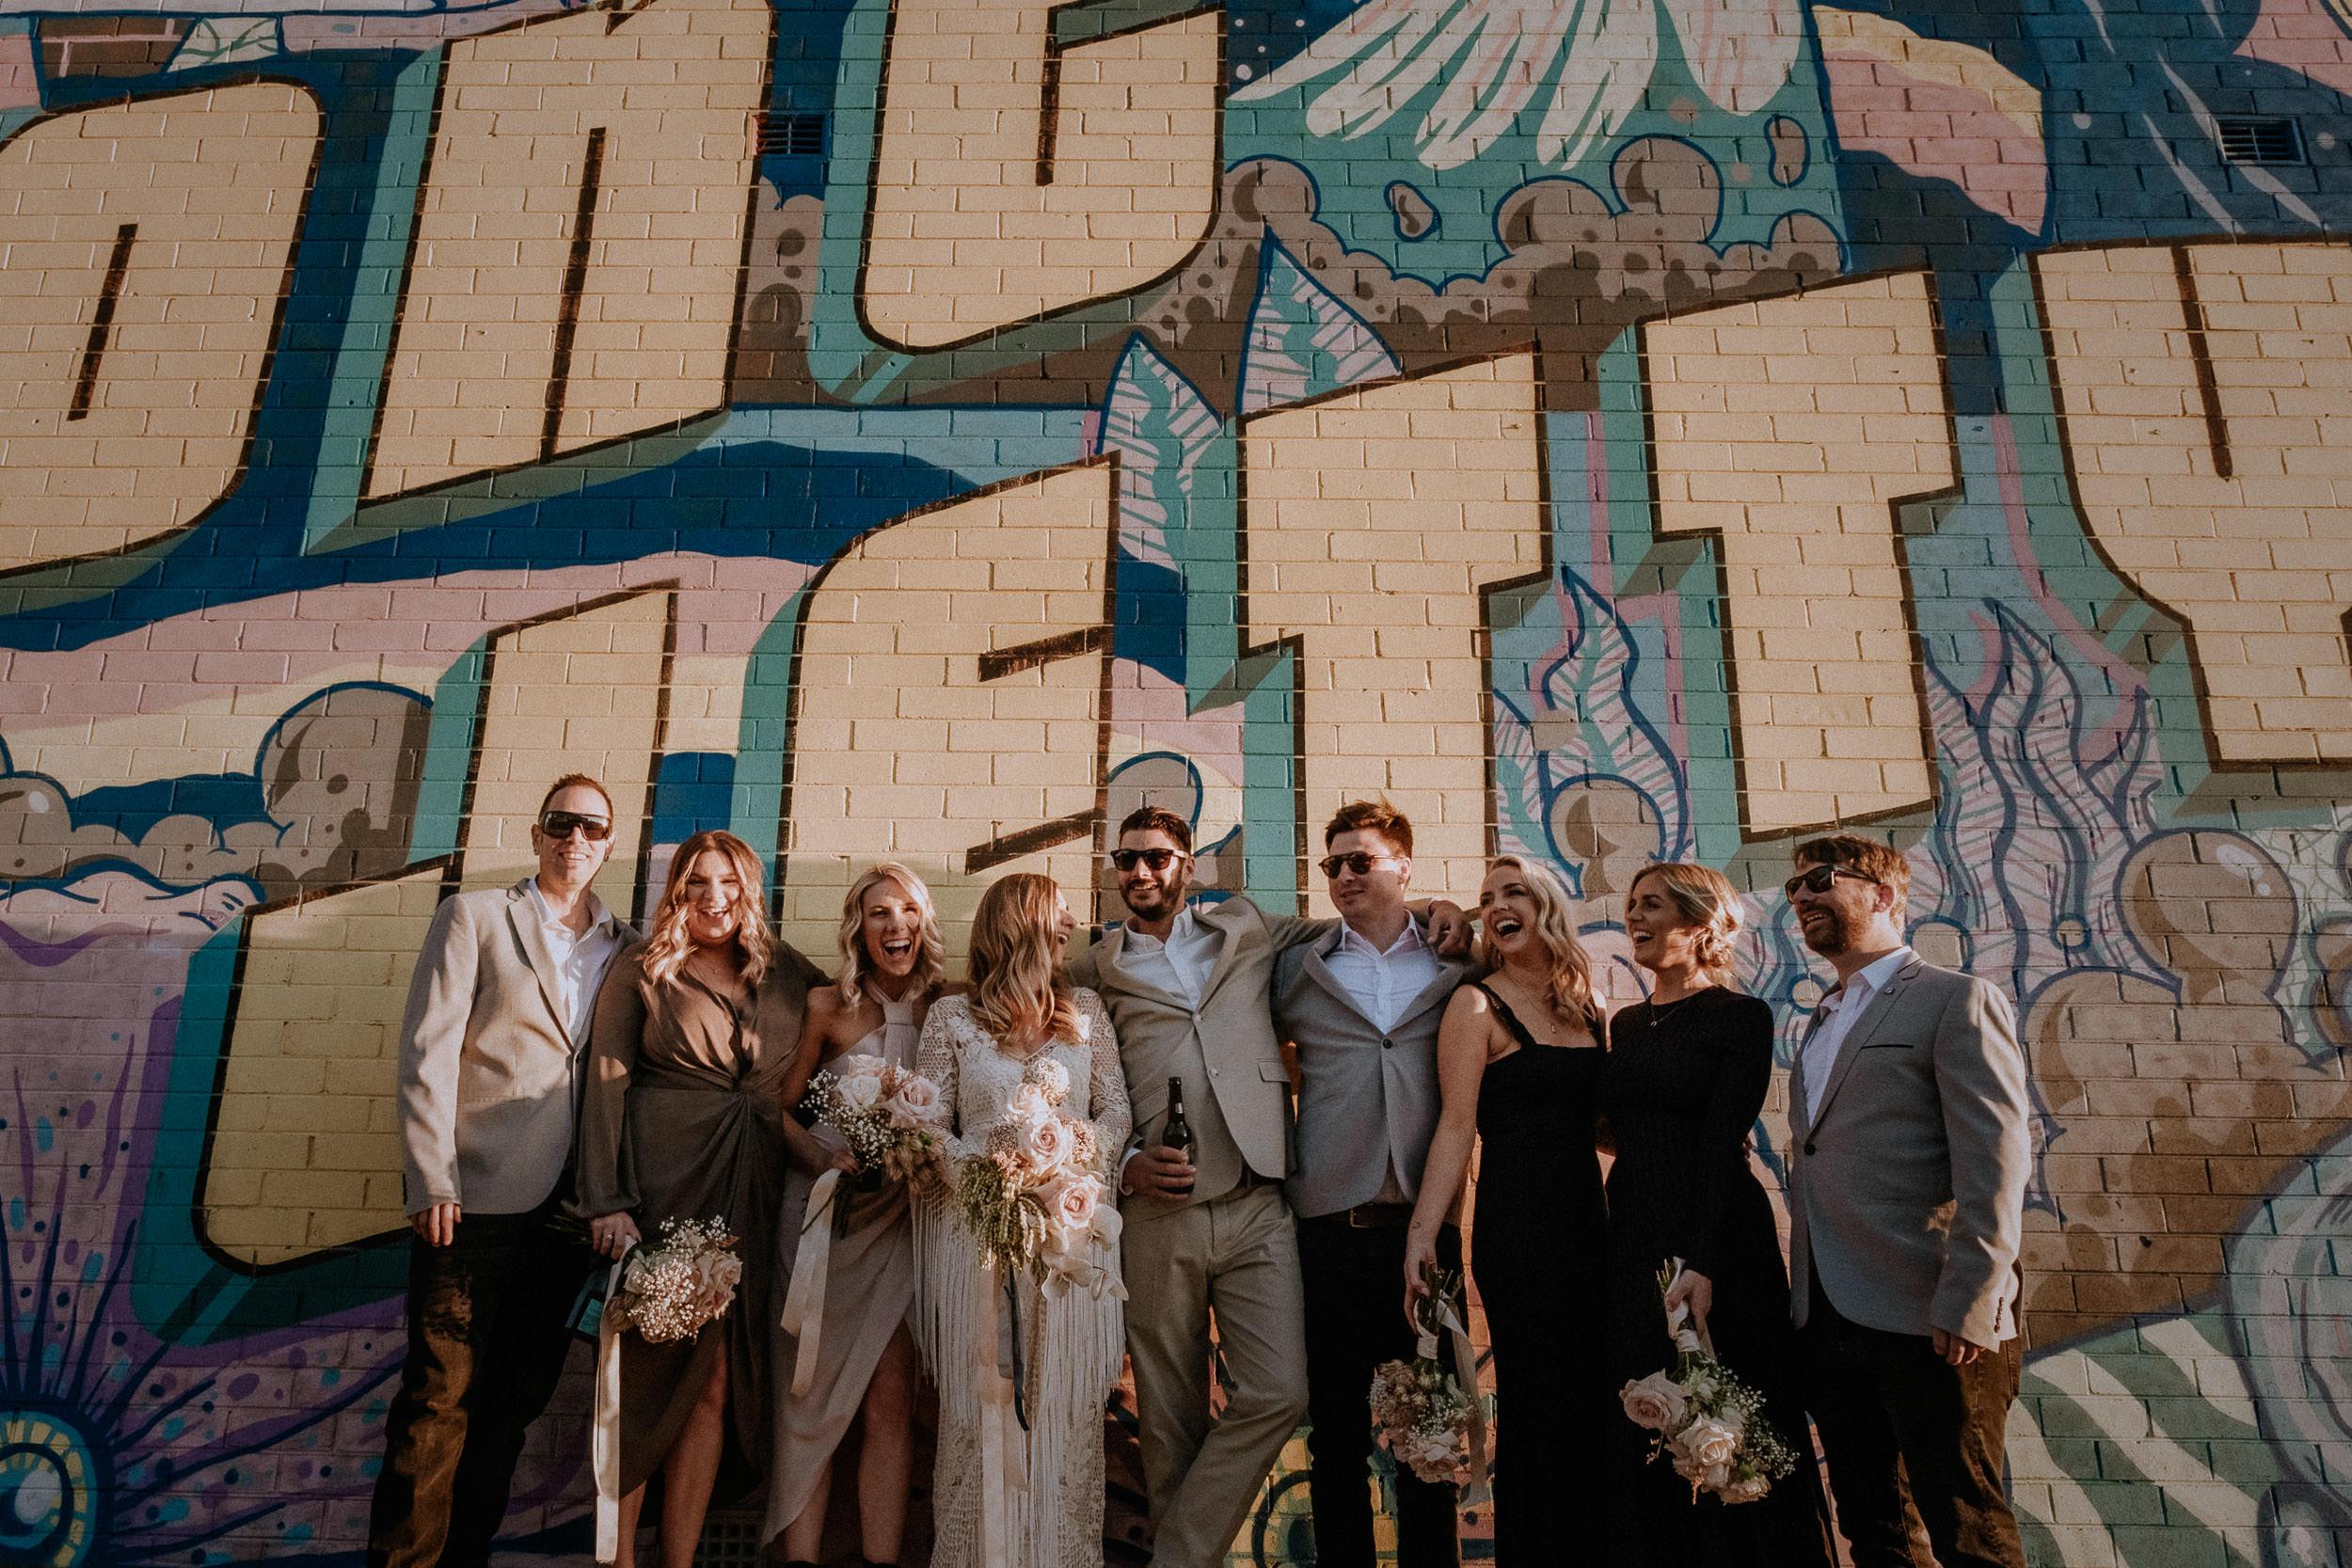 S&A Elopement - Kings & Thieves - Shred 'Til Dead - Central Coast Beach Forest Wedding - 347.jpg